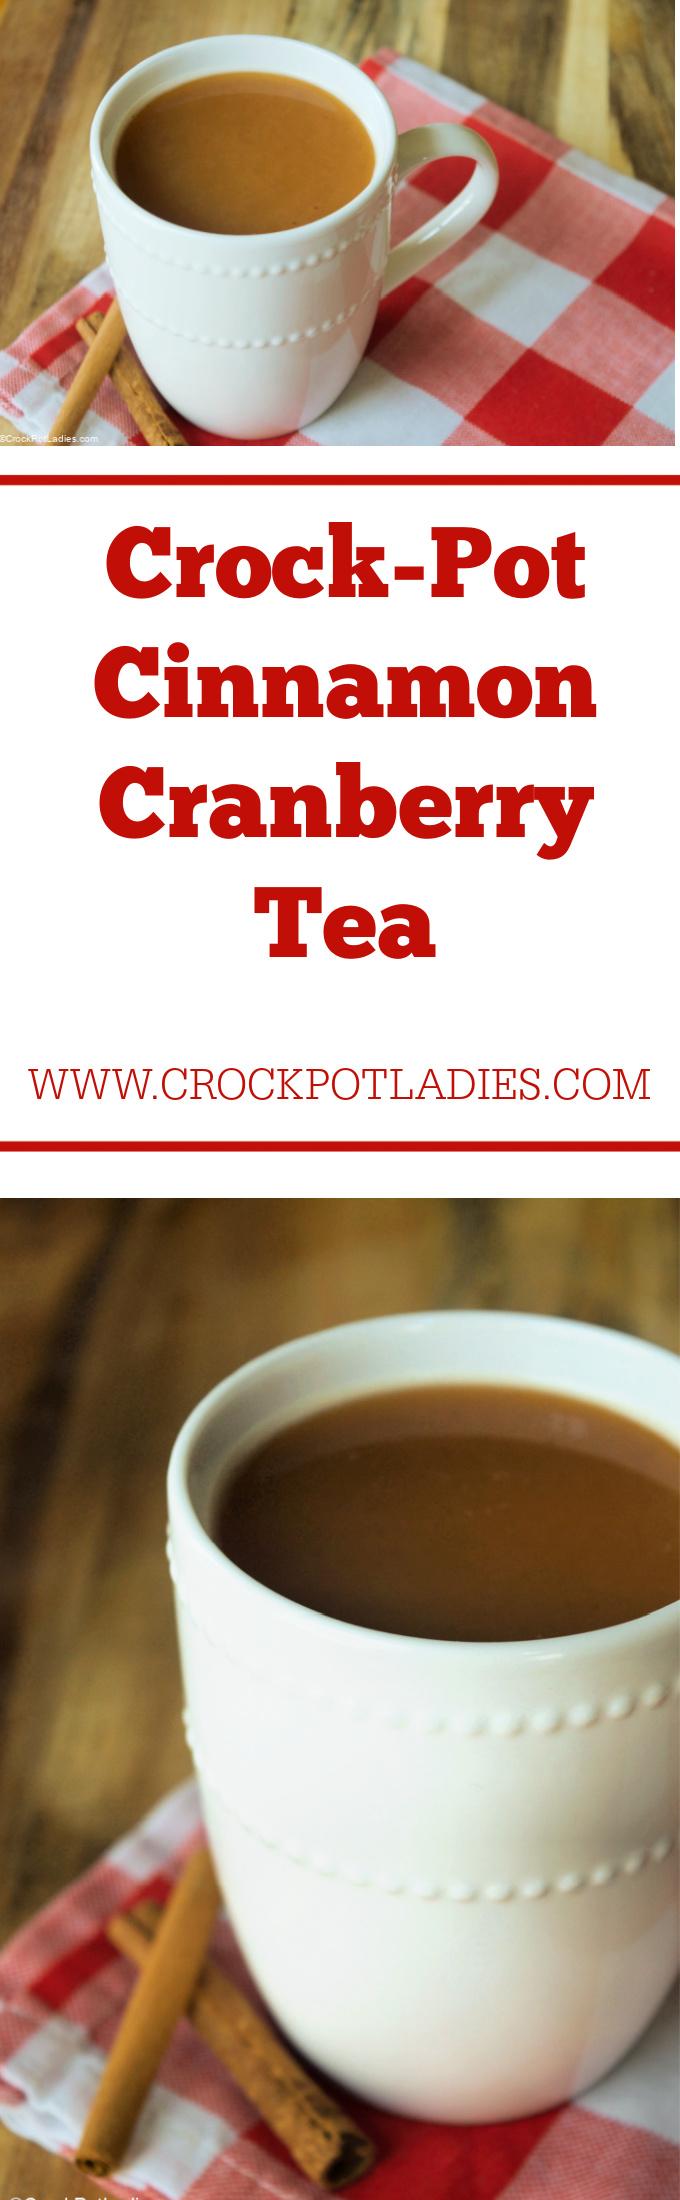 Crock-Pot Cinnamon Cranberry Tea